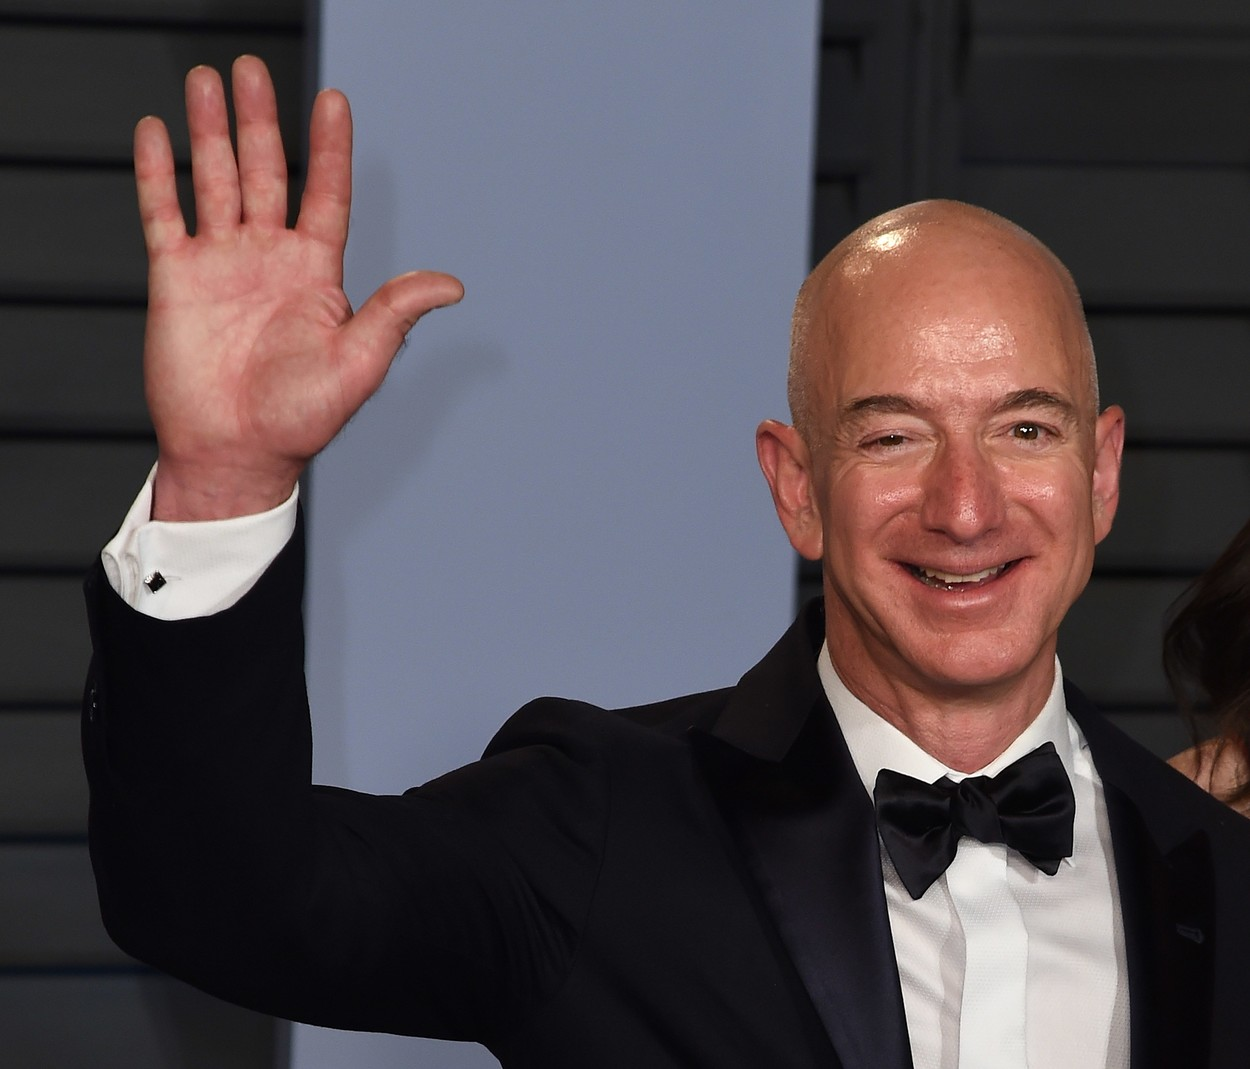 Jeff Bezos a demisionat din funcția de director general al companiei Amazon